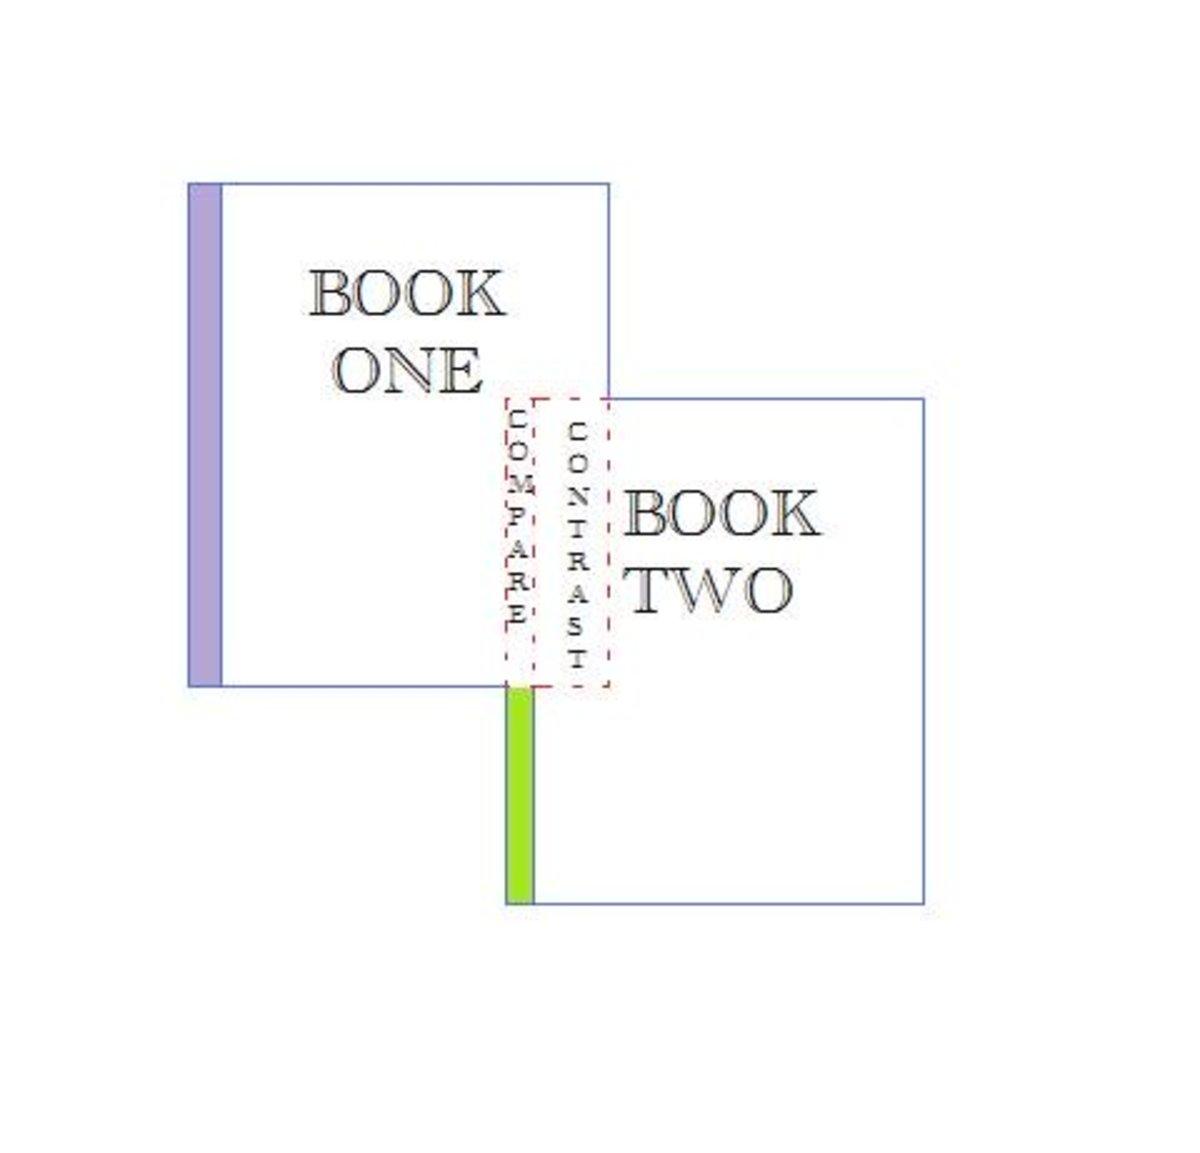 Write essay comparing two books